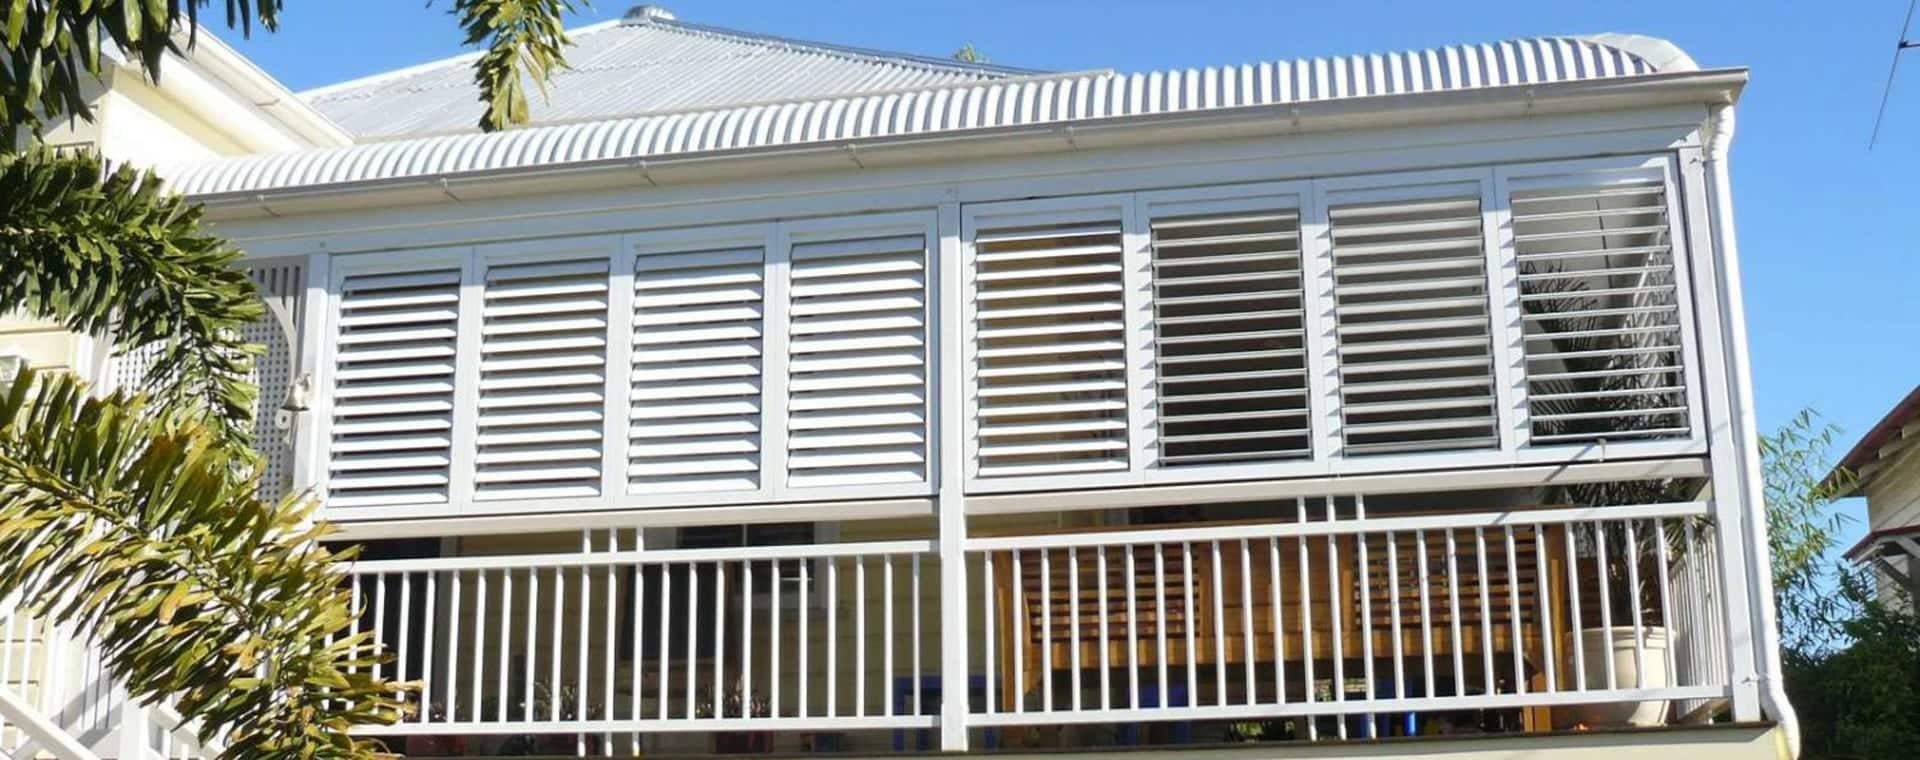 Outdoor Aluminium Shutters Brisbane To Ipswich Aluminium